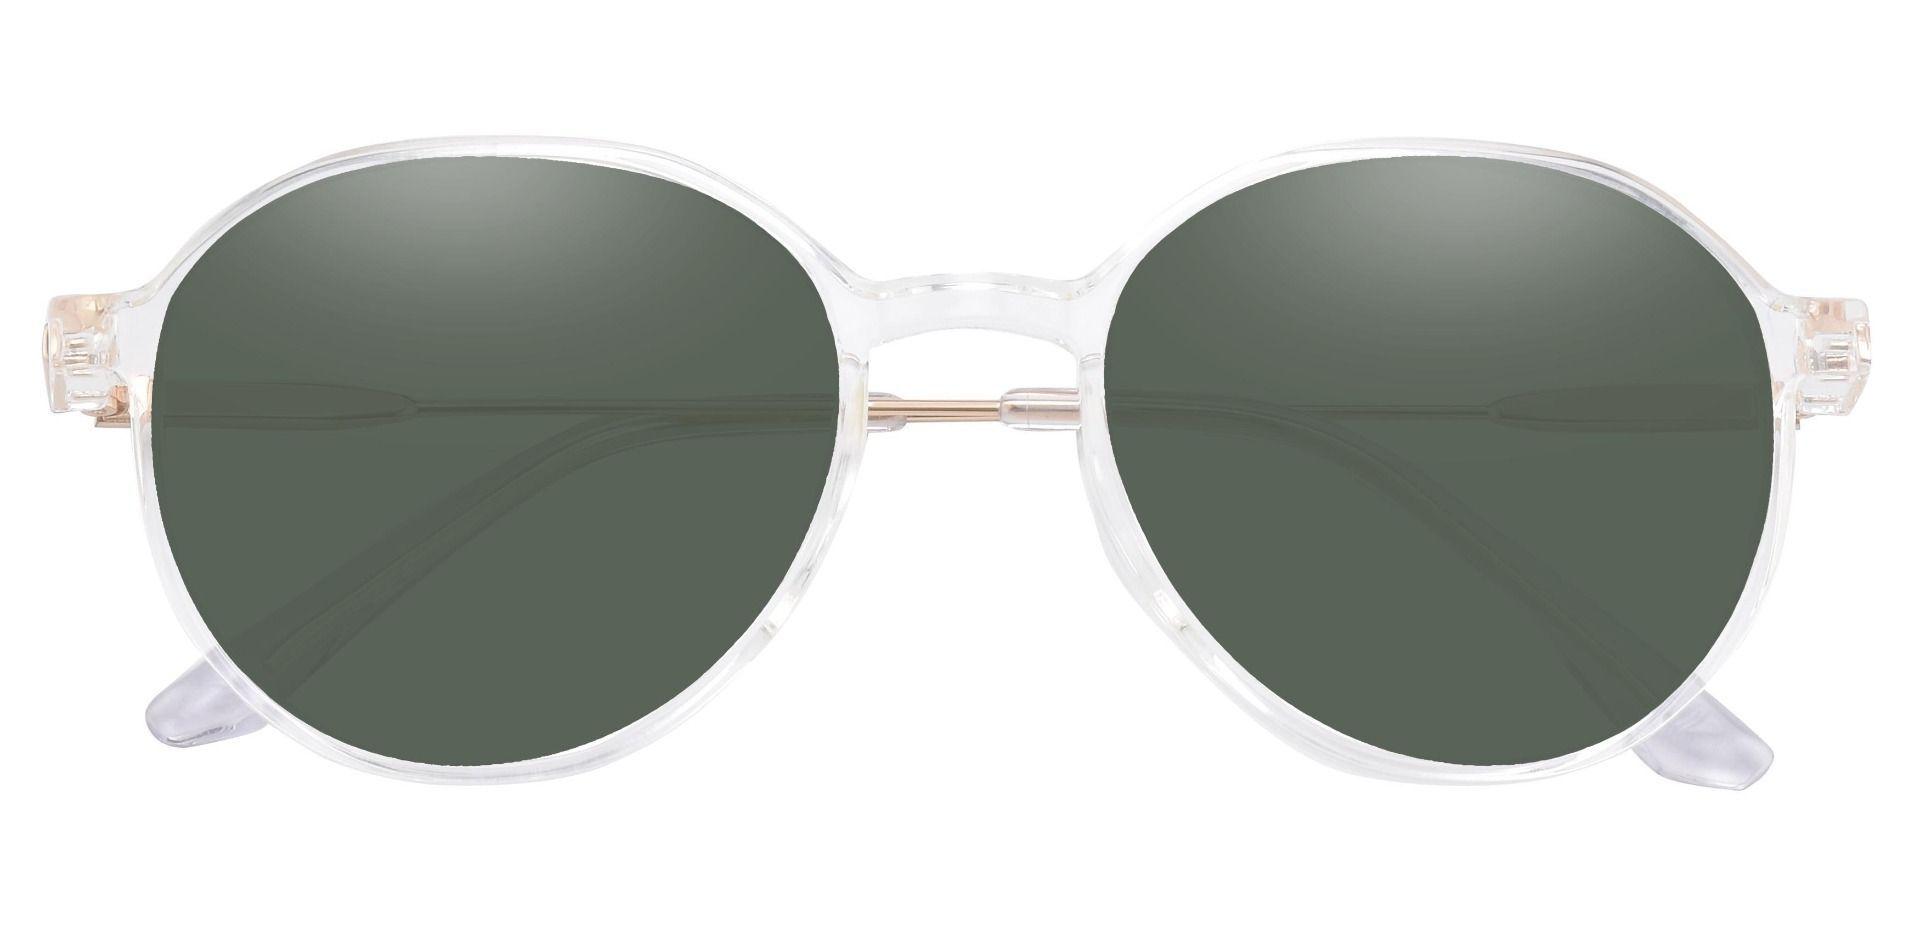 Daytona Geometric Progressive Sunglasses - Clear Frame With Green Lenses